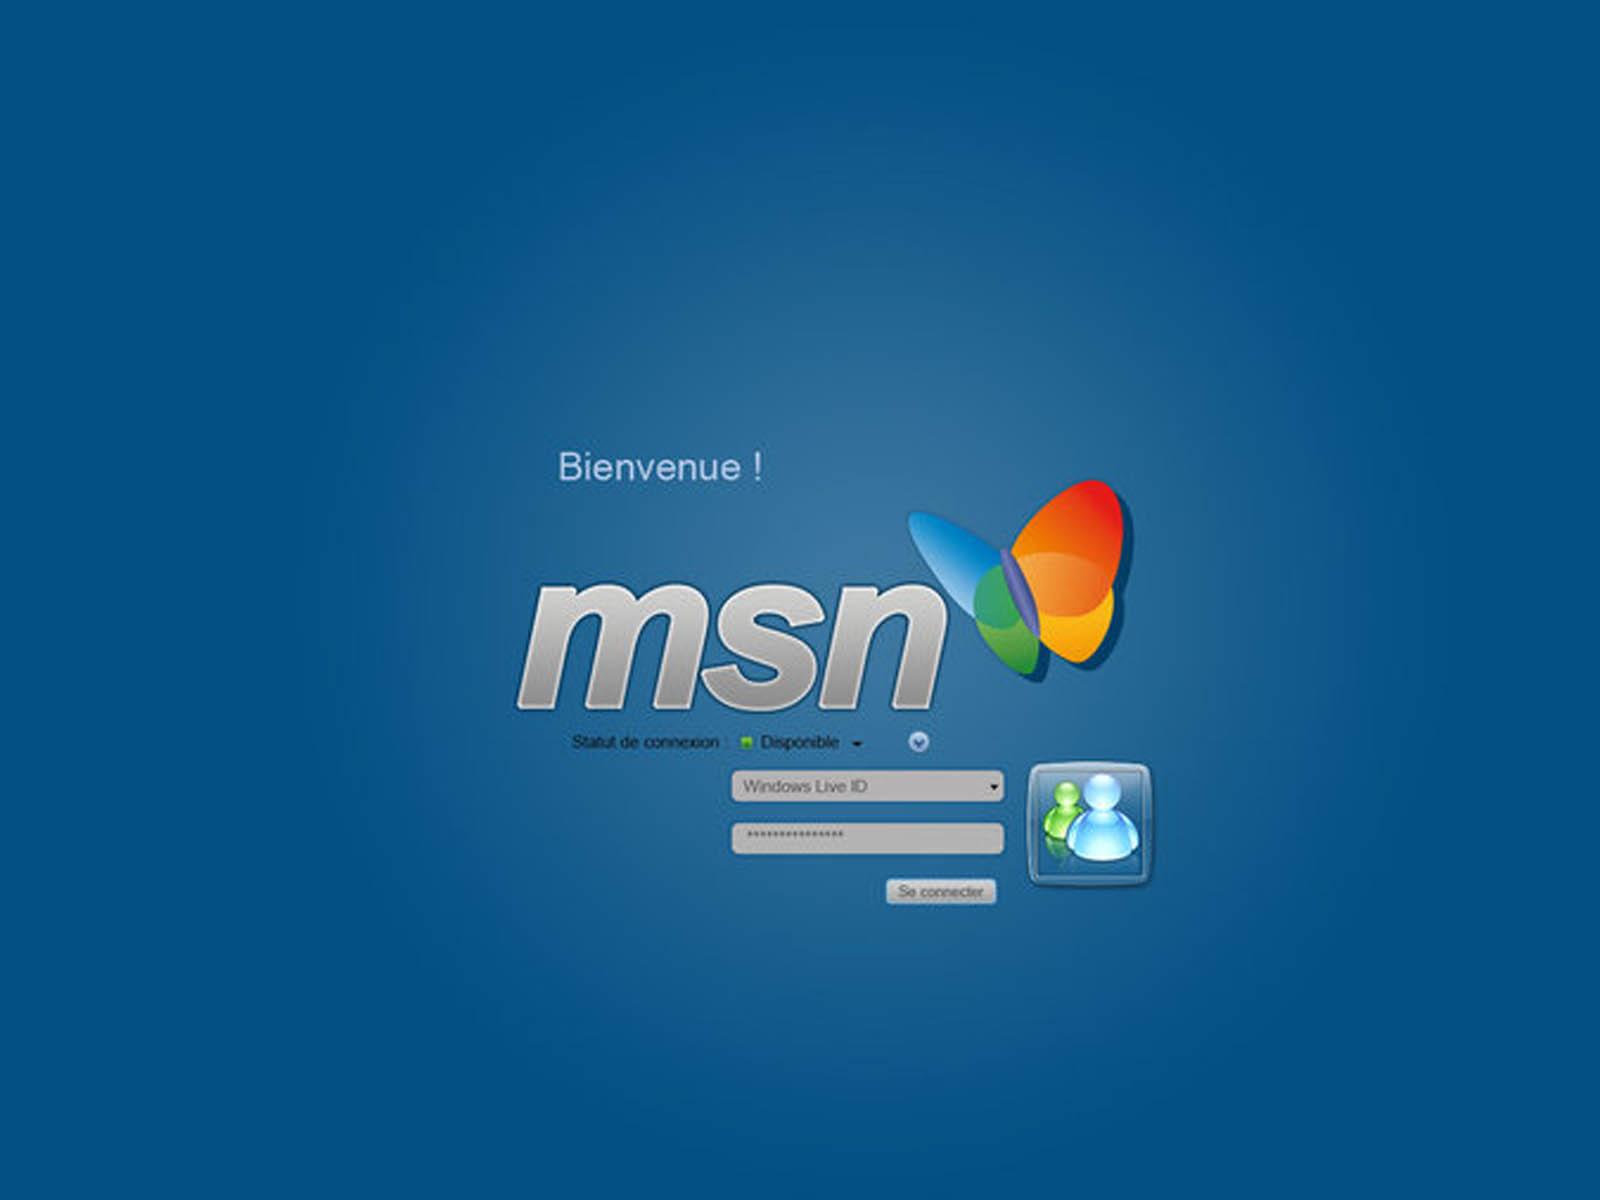 Msn Wallpaper | Msn Desktop Background - Anny Imagenes!